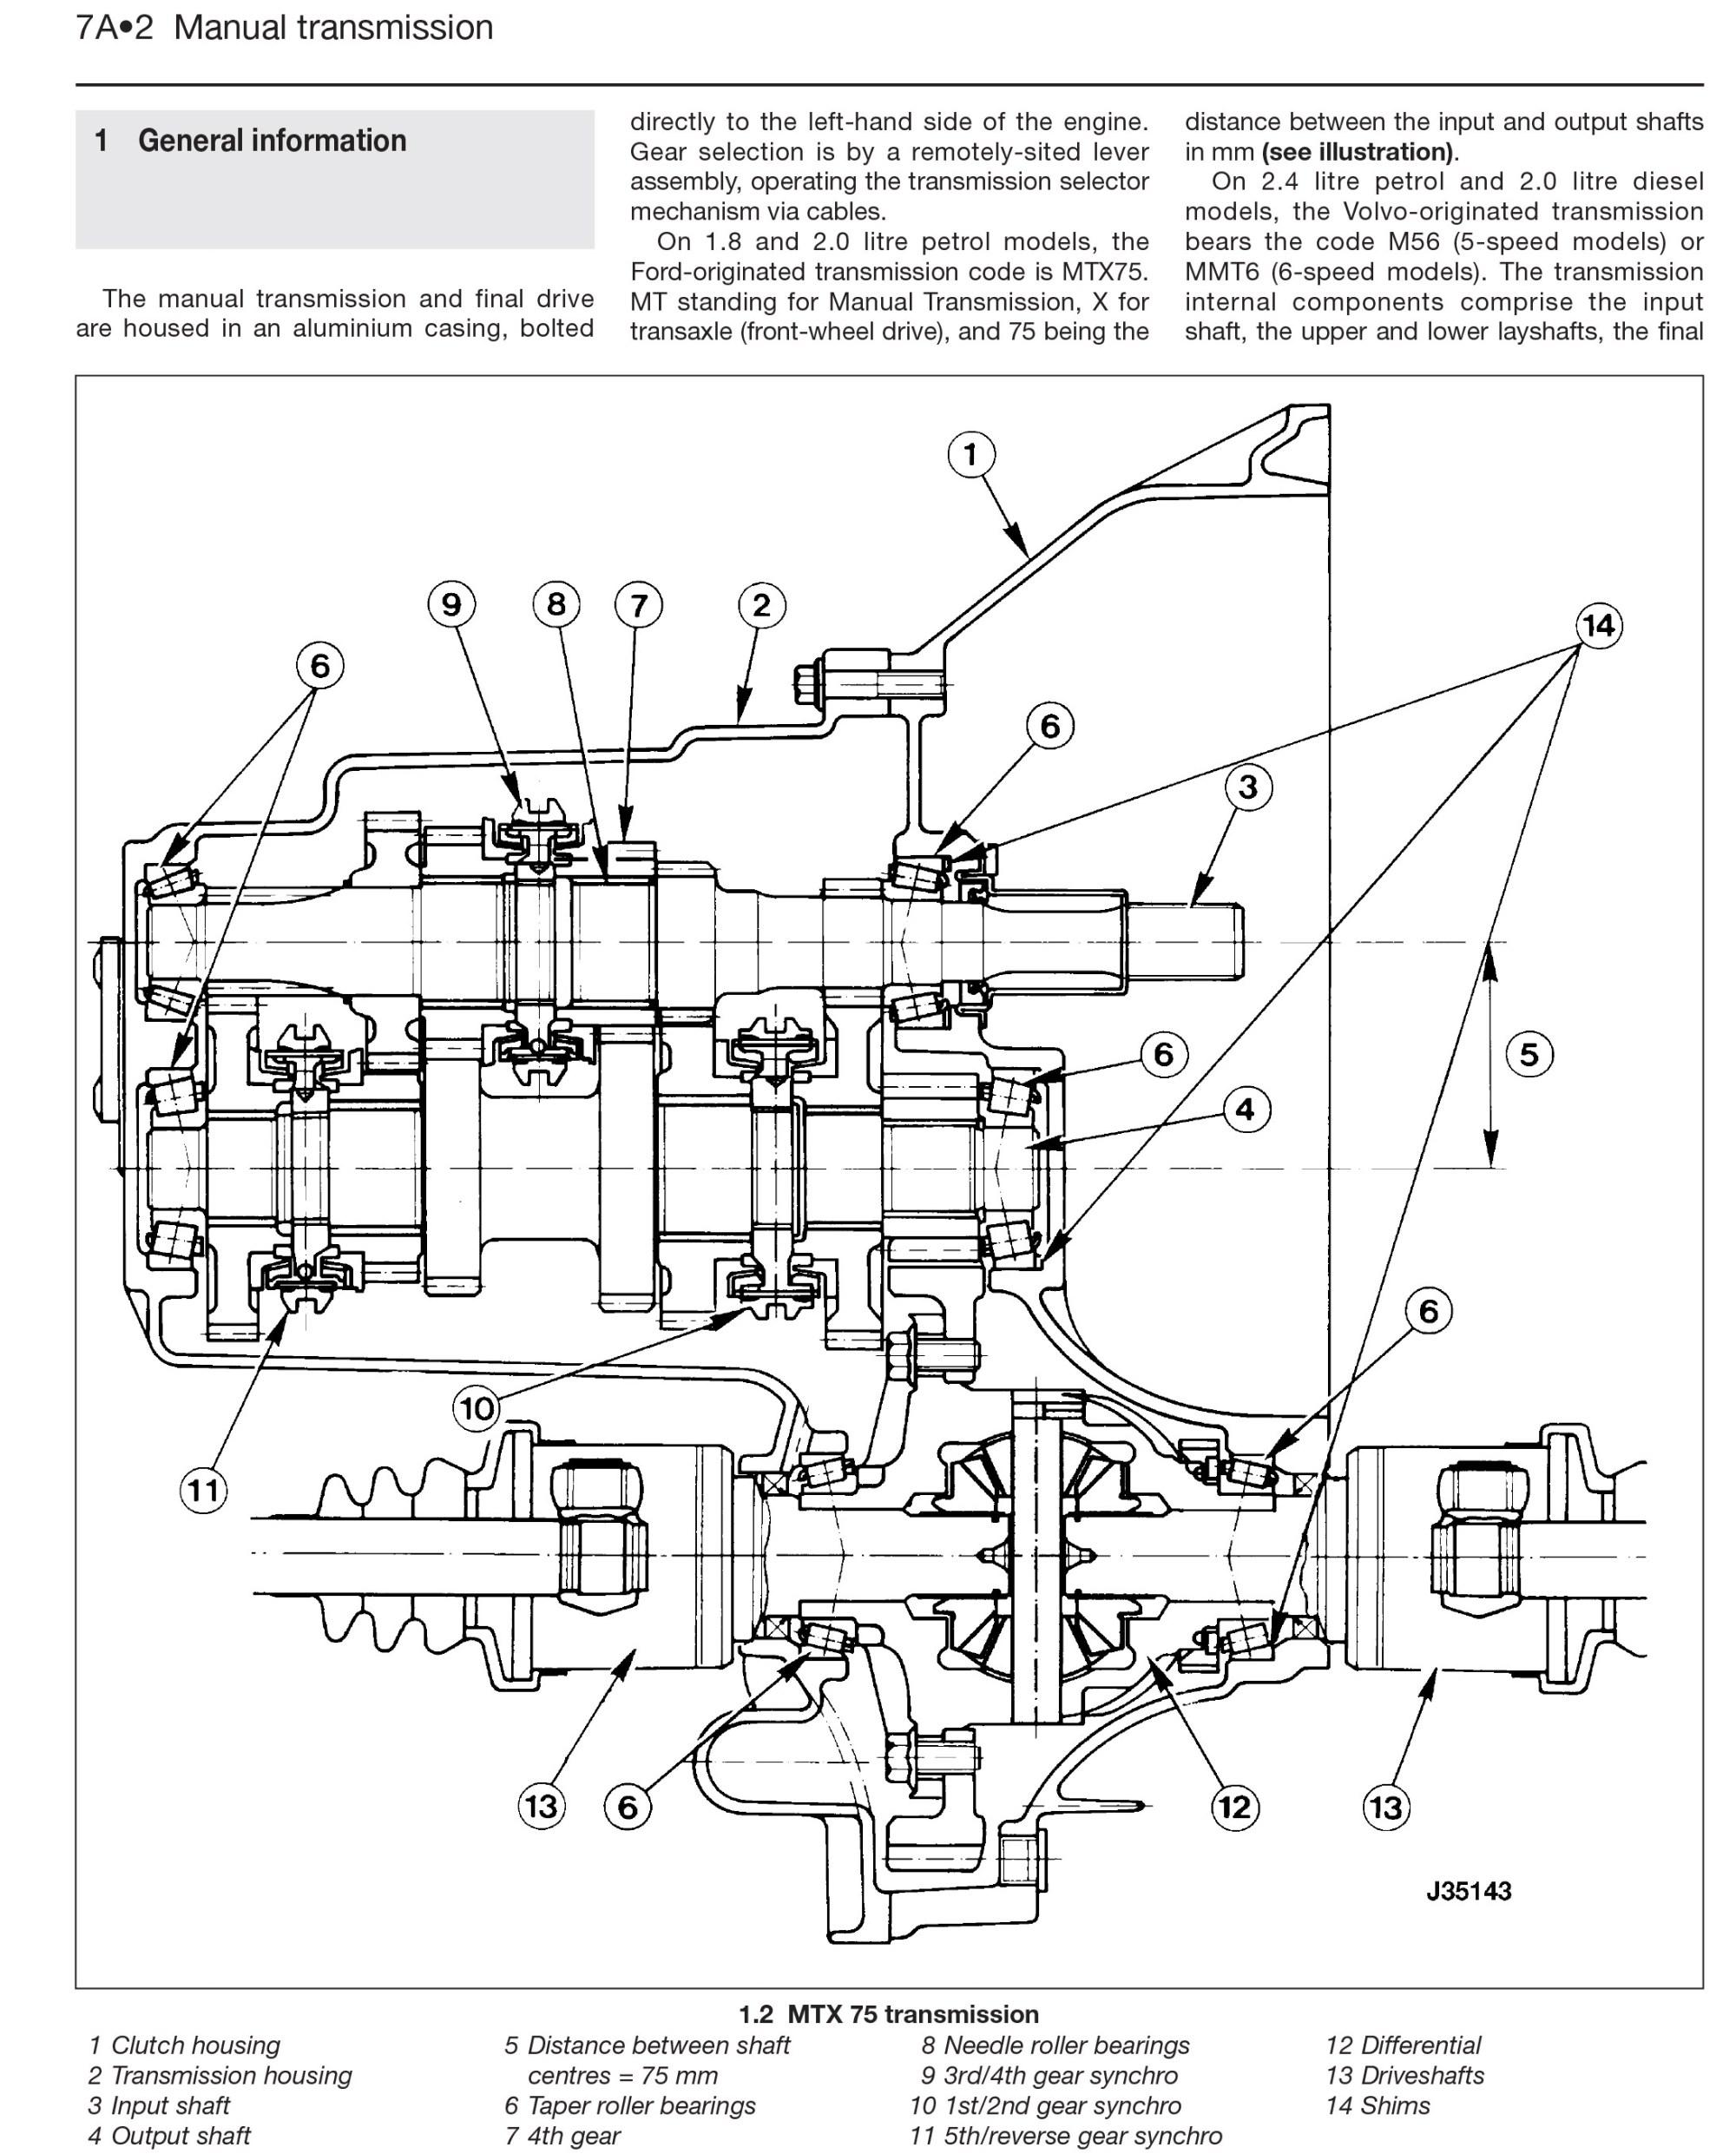 hight resolution of volvo transmission diagrams wiring diagram name harley davidson transmission to motor diagrams free download wiring